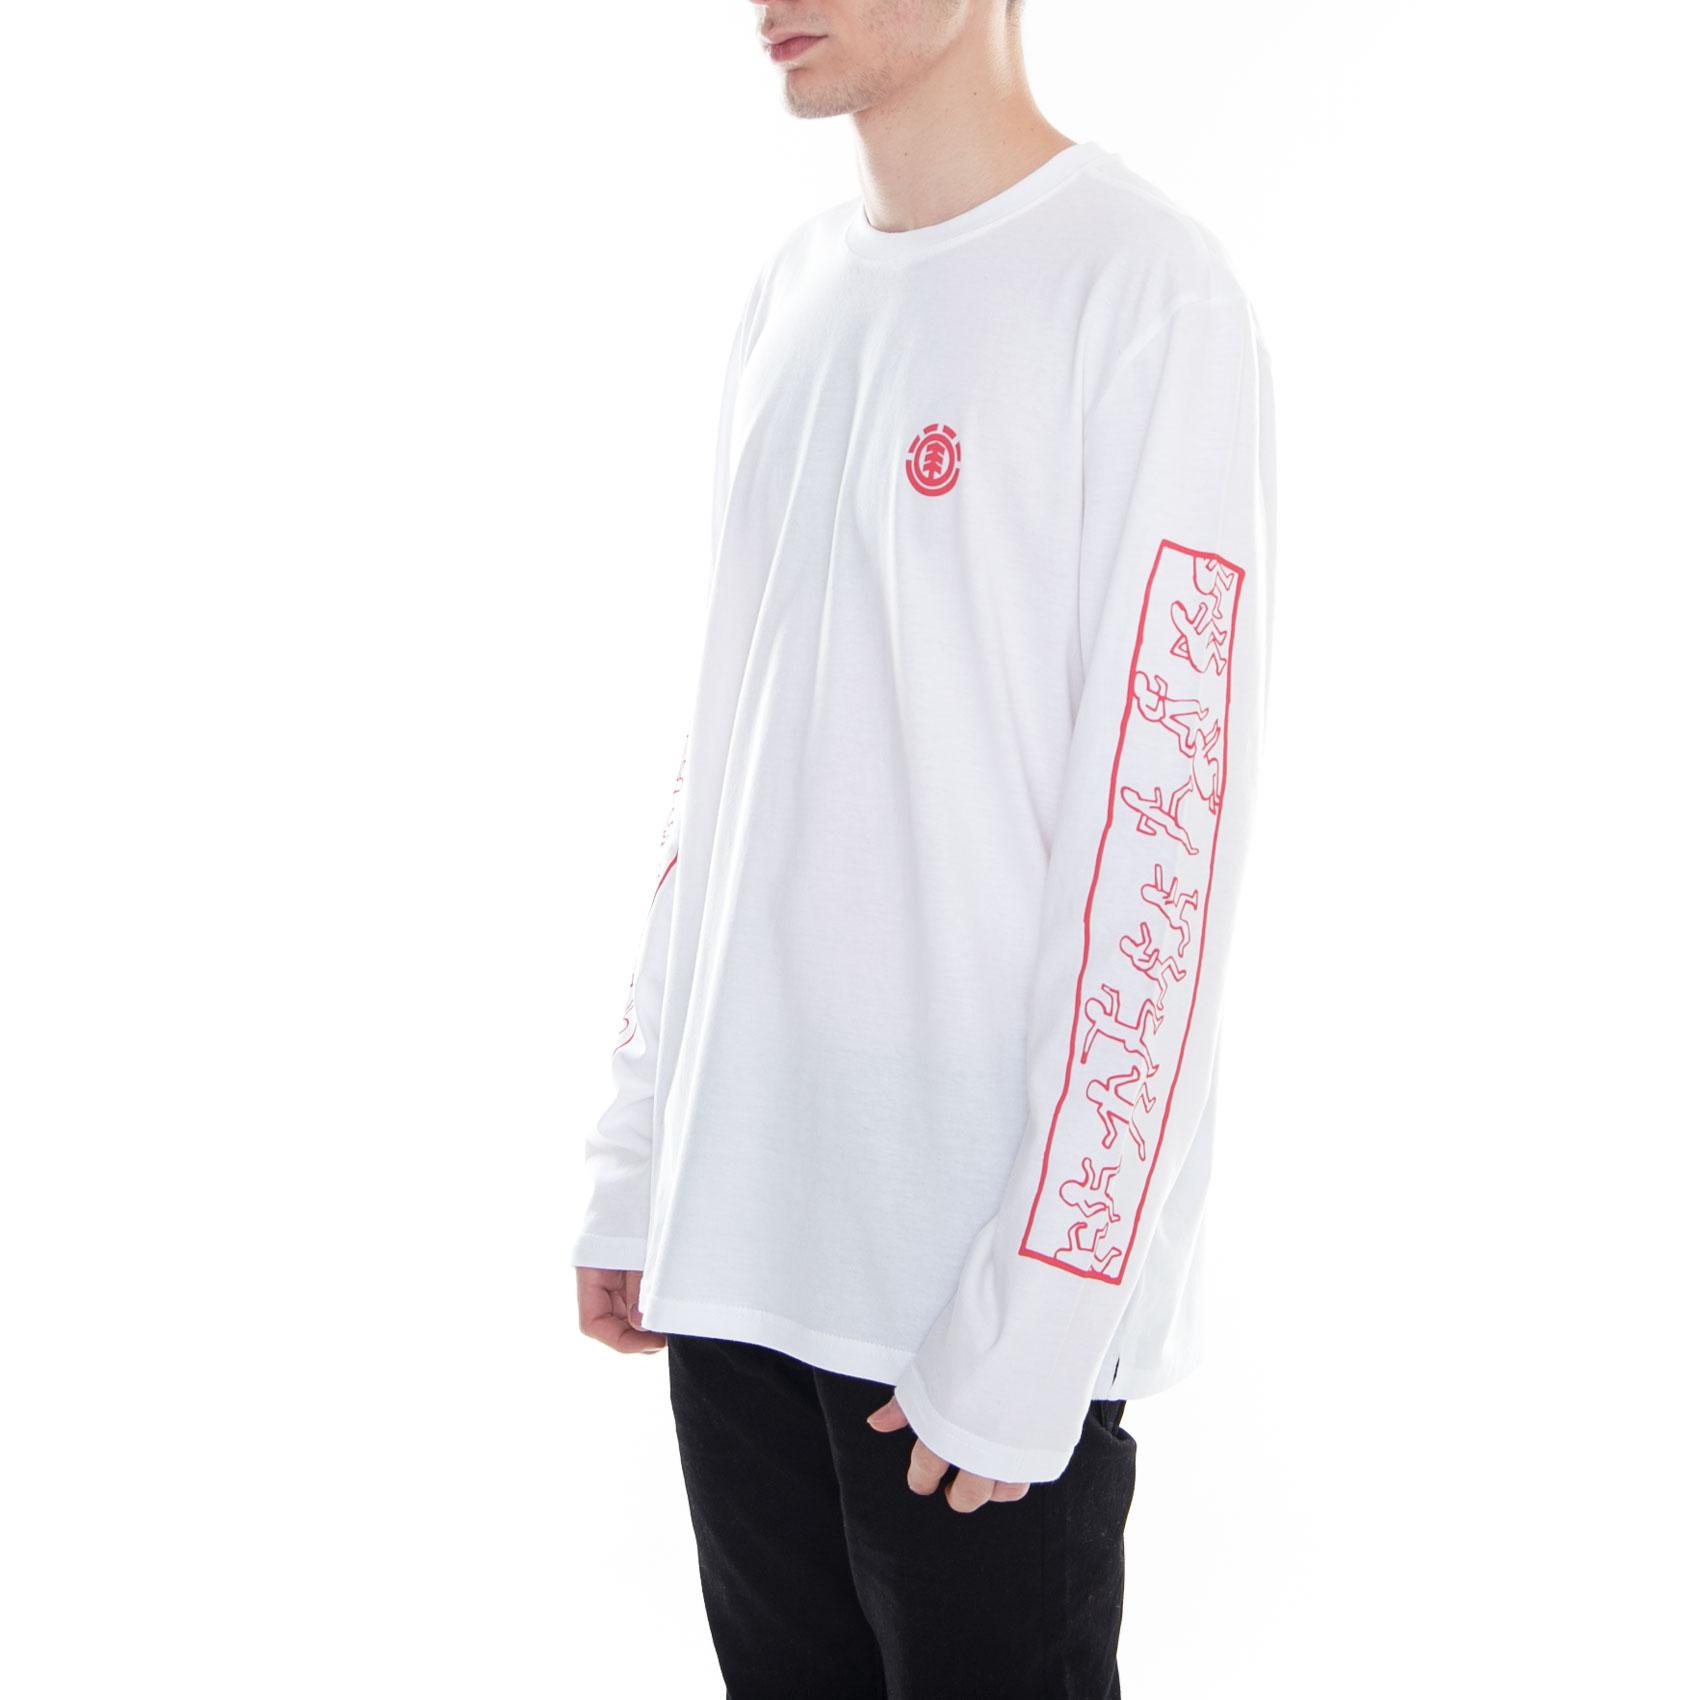 ab2642cc18b7 Element T-Shirt Keith Haring Jump Ls Tee Optic White Bianco 2 2 di 3 ...